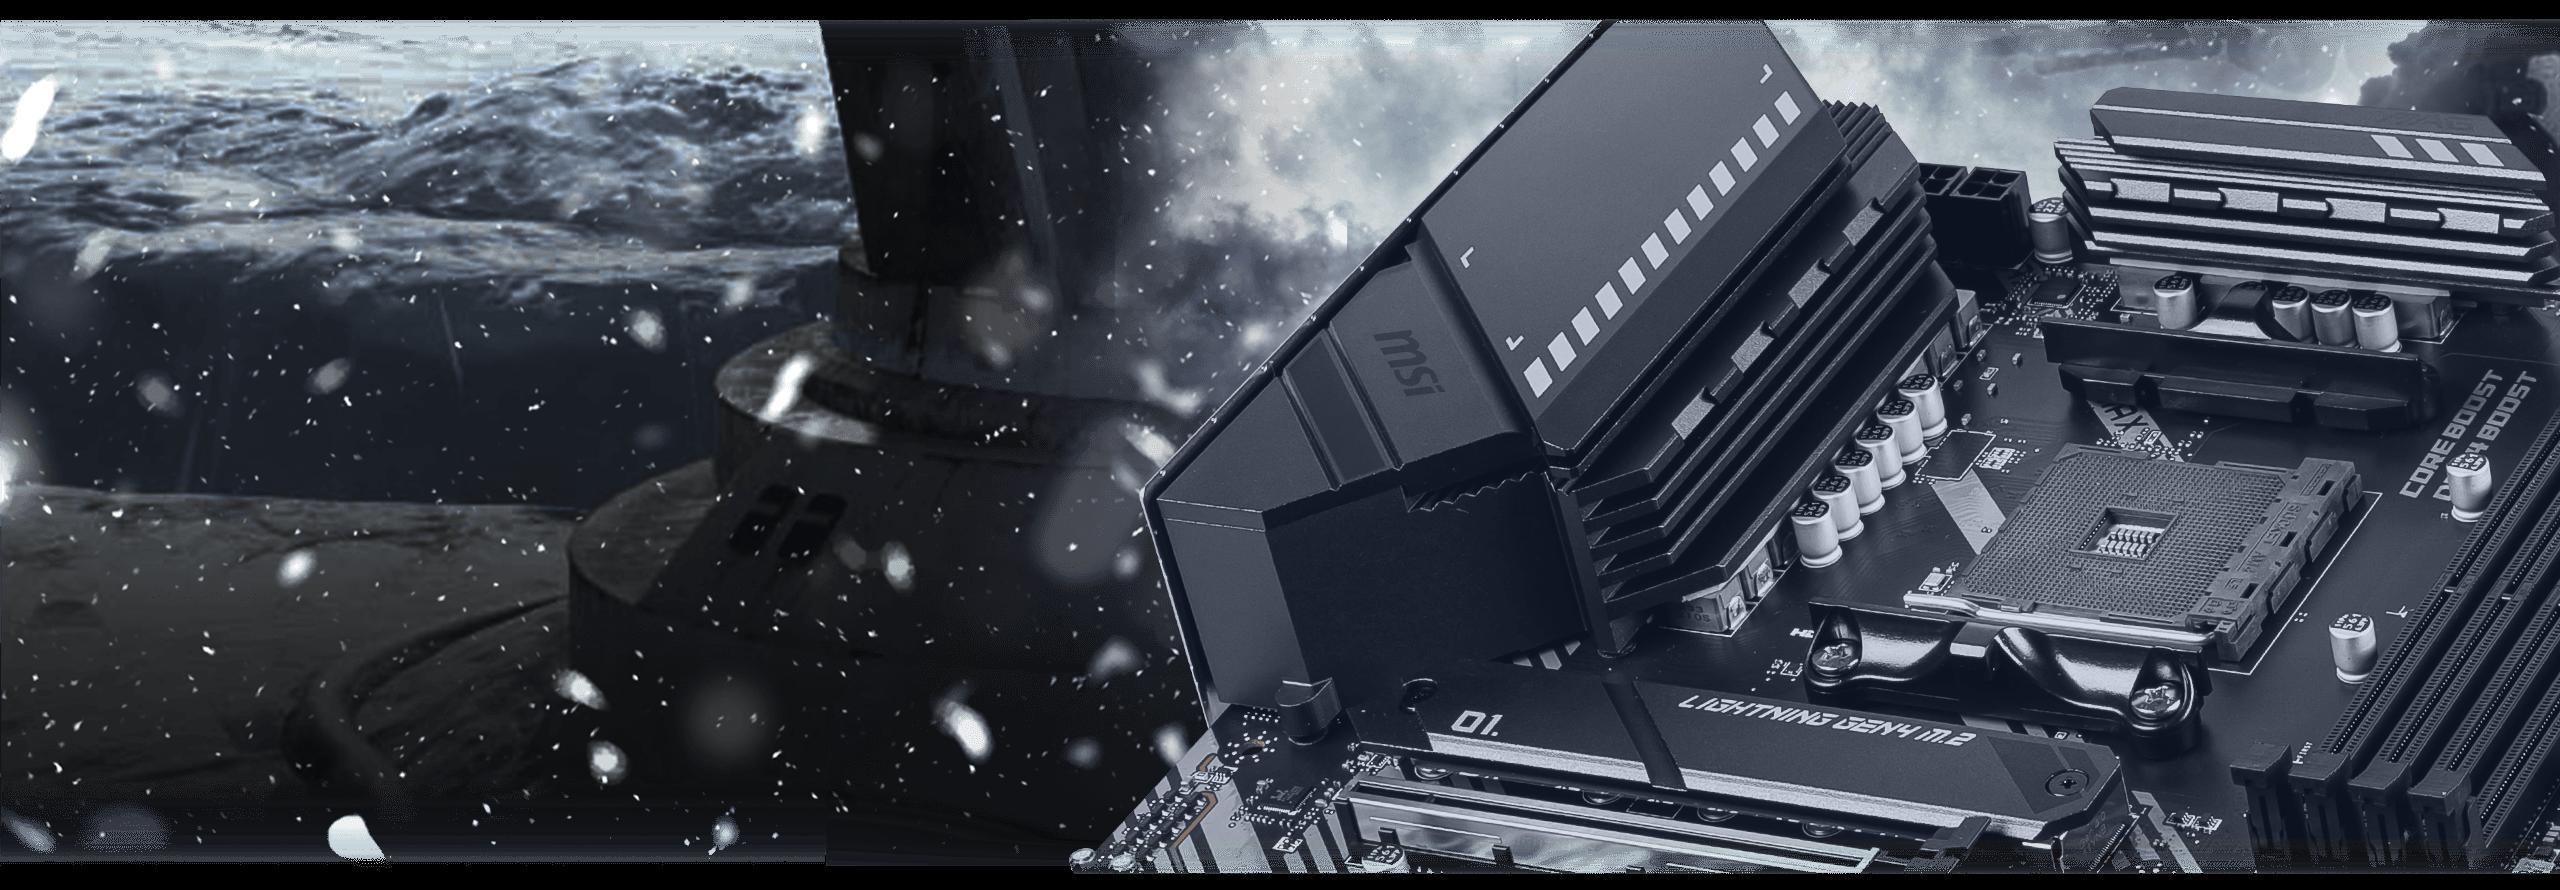 x570s enhanced performance